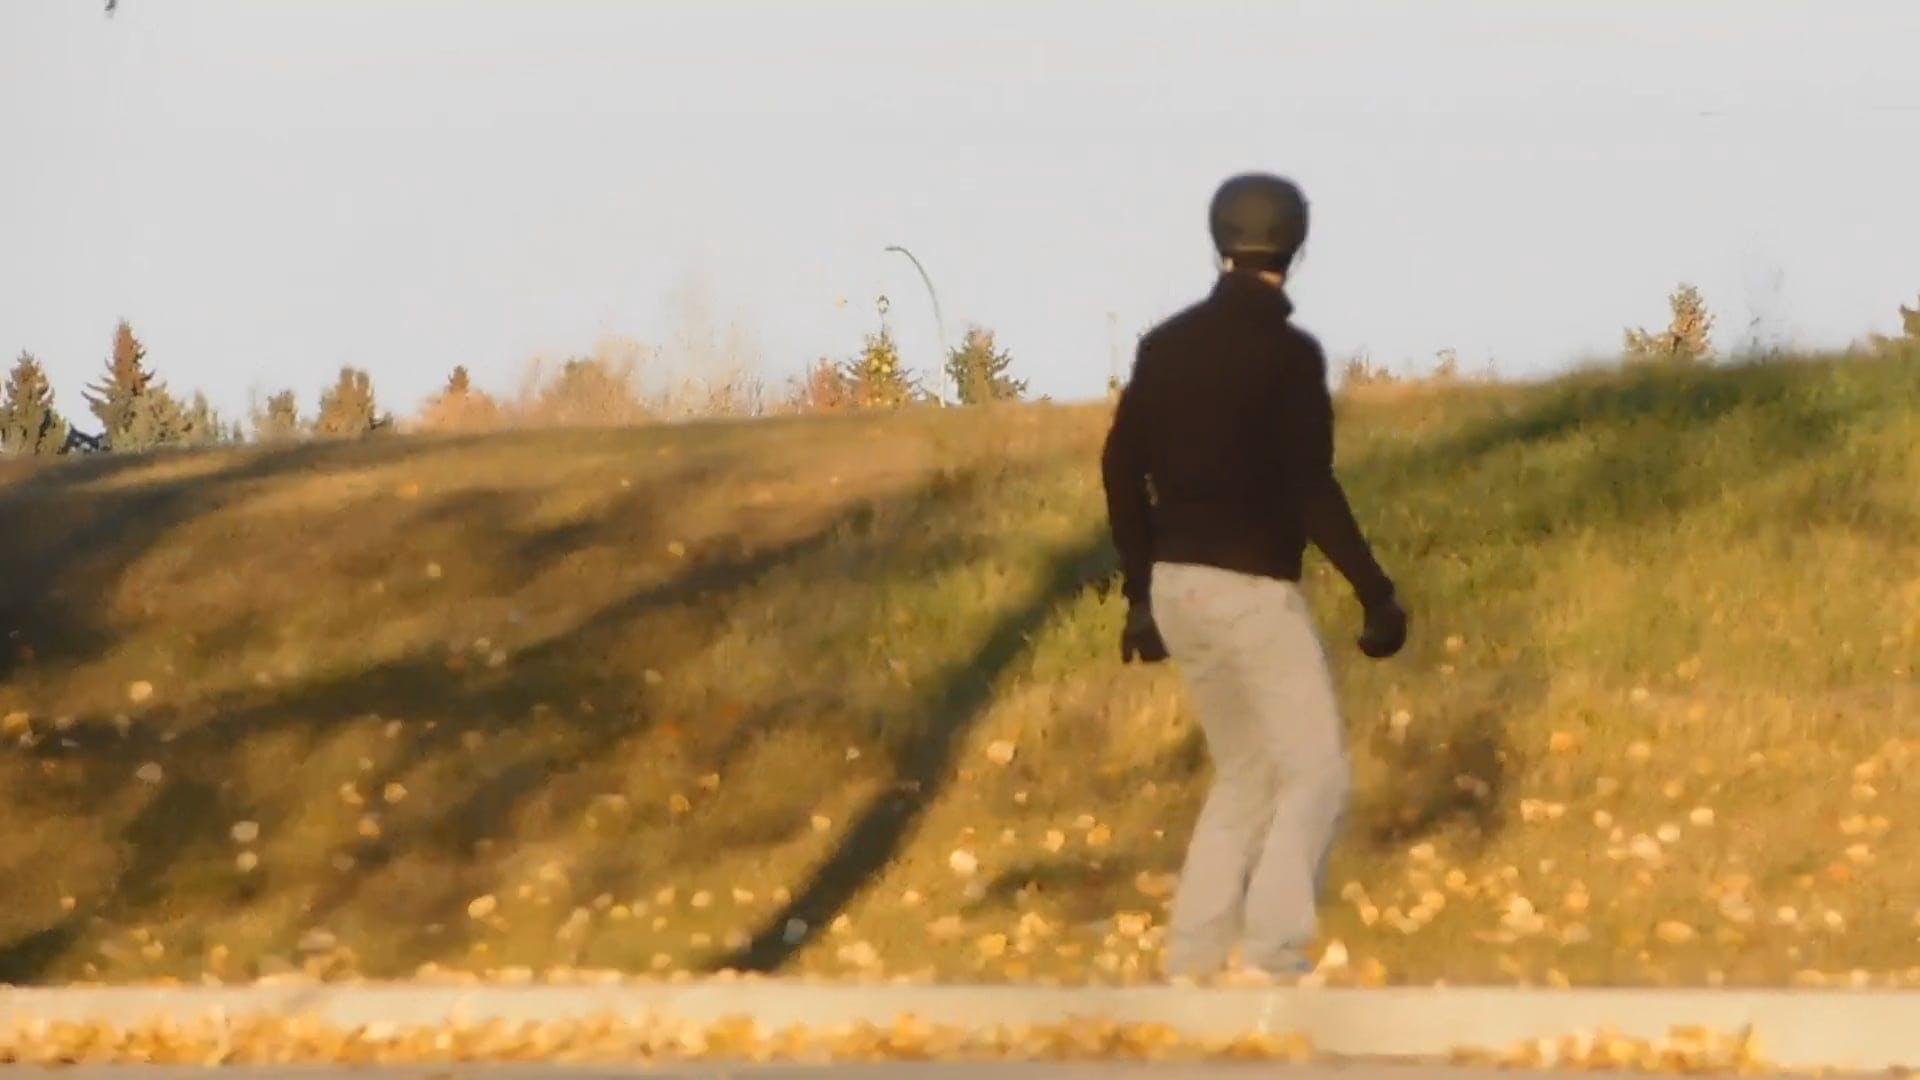 An Individual Using A Skateboard